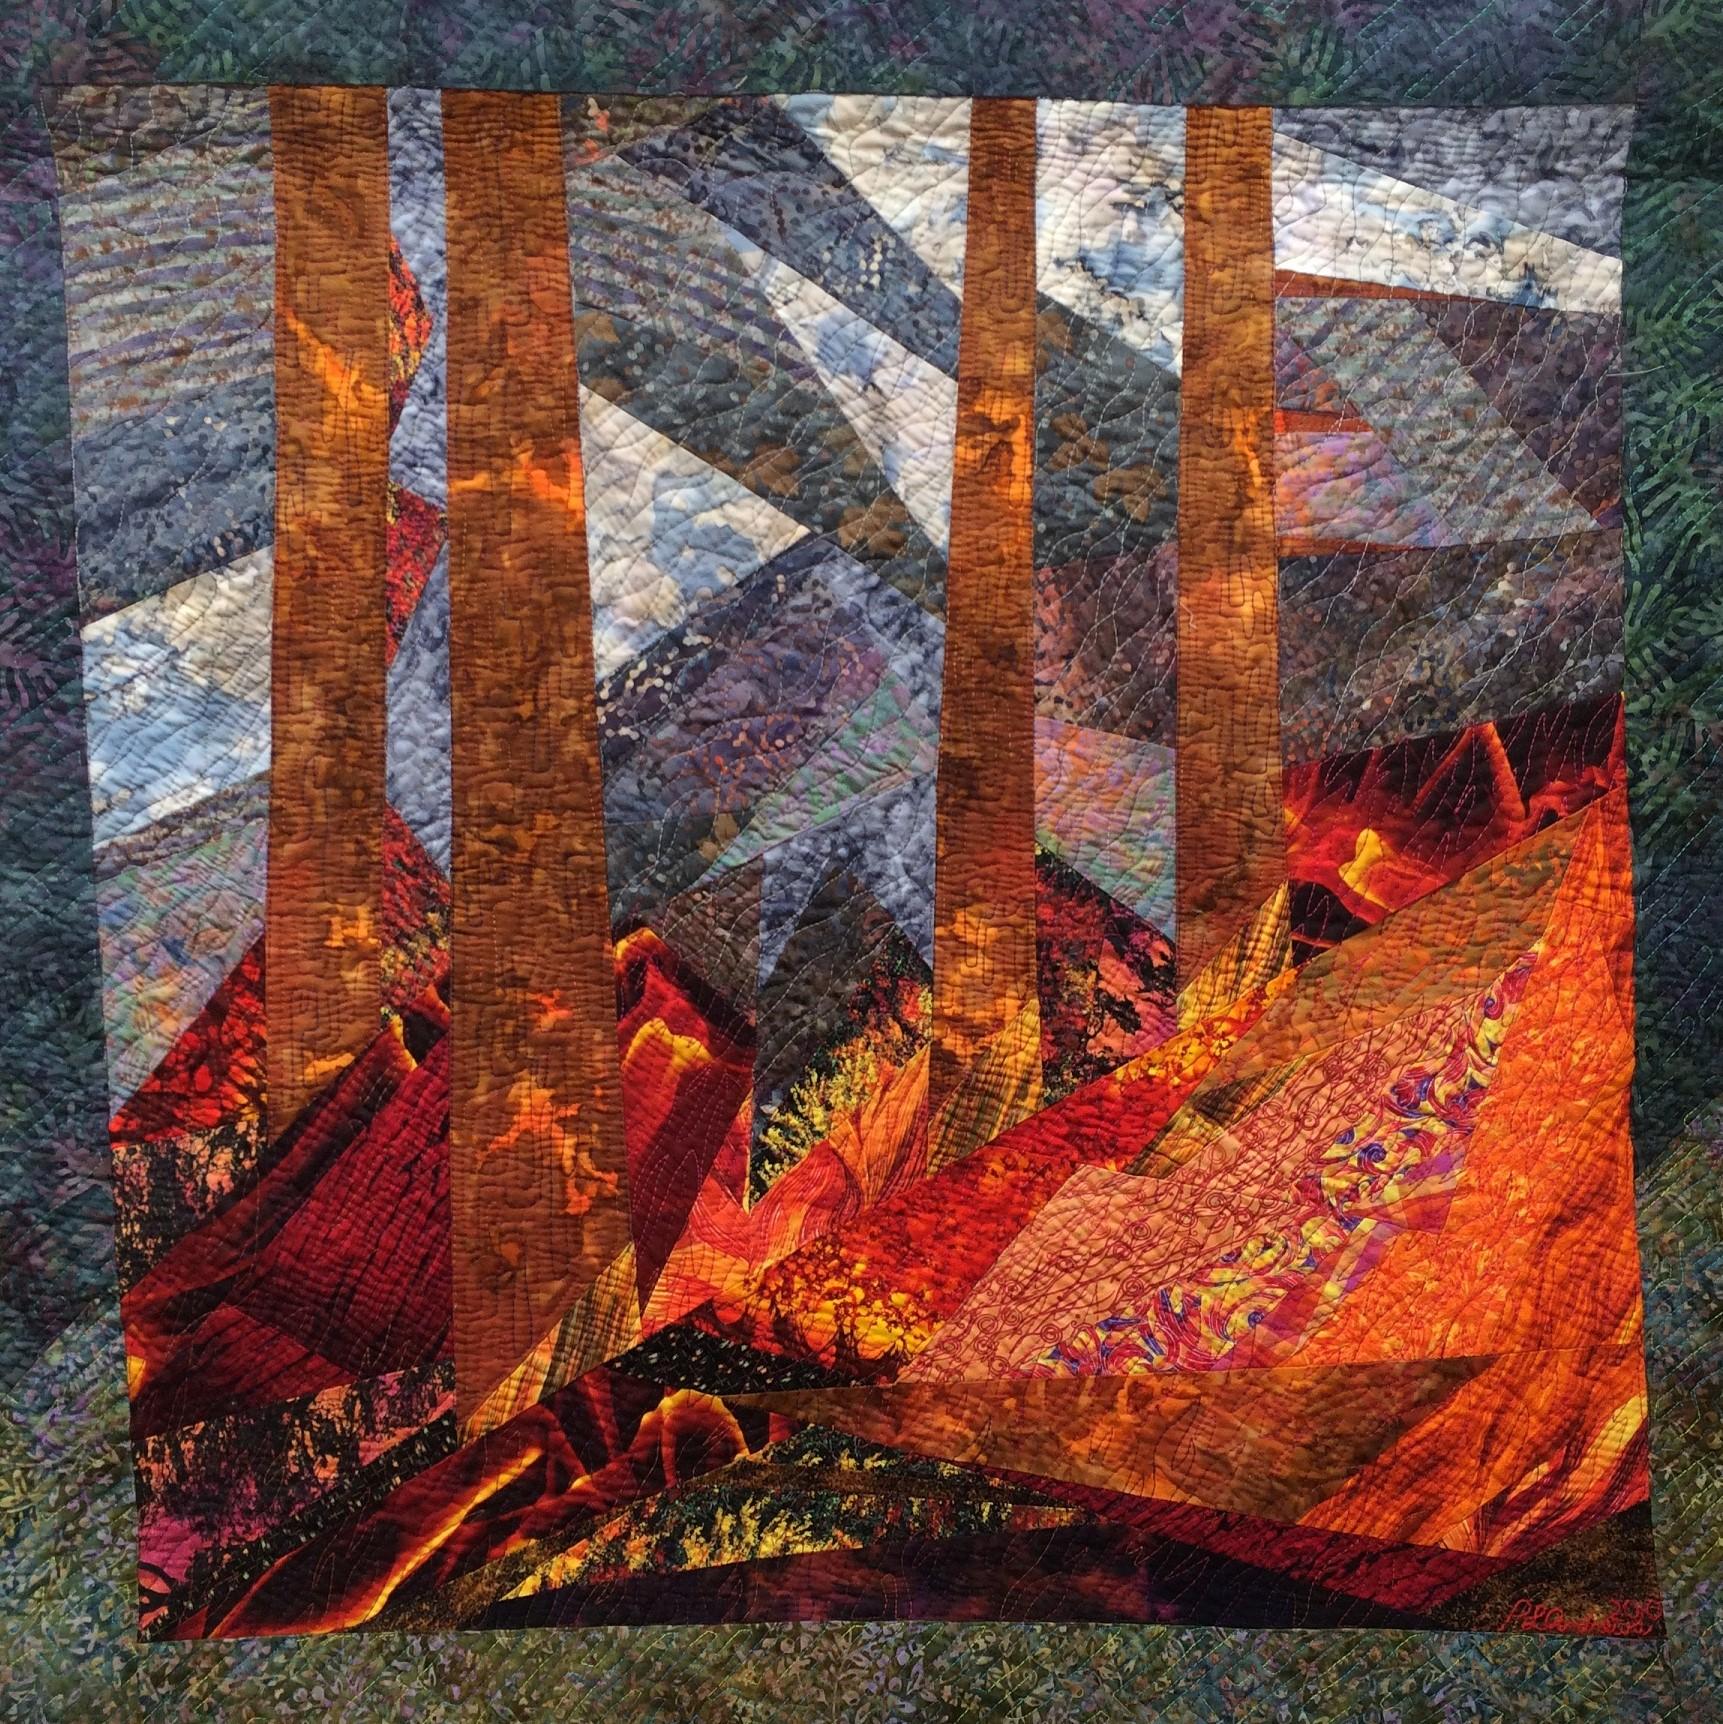 Underburn   - Pat Andrews